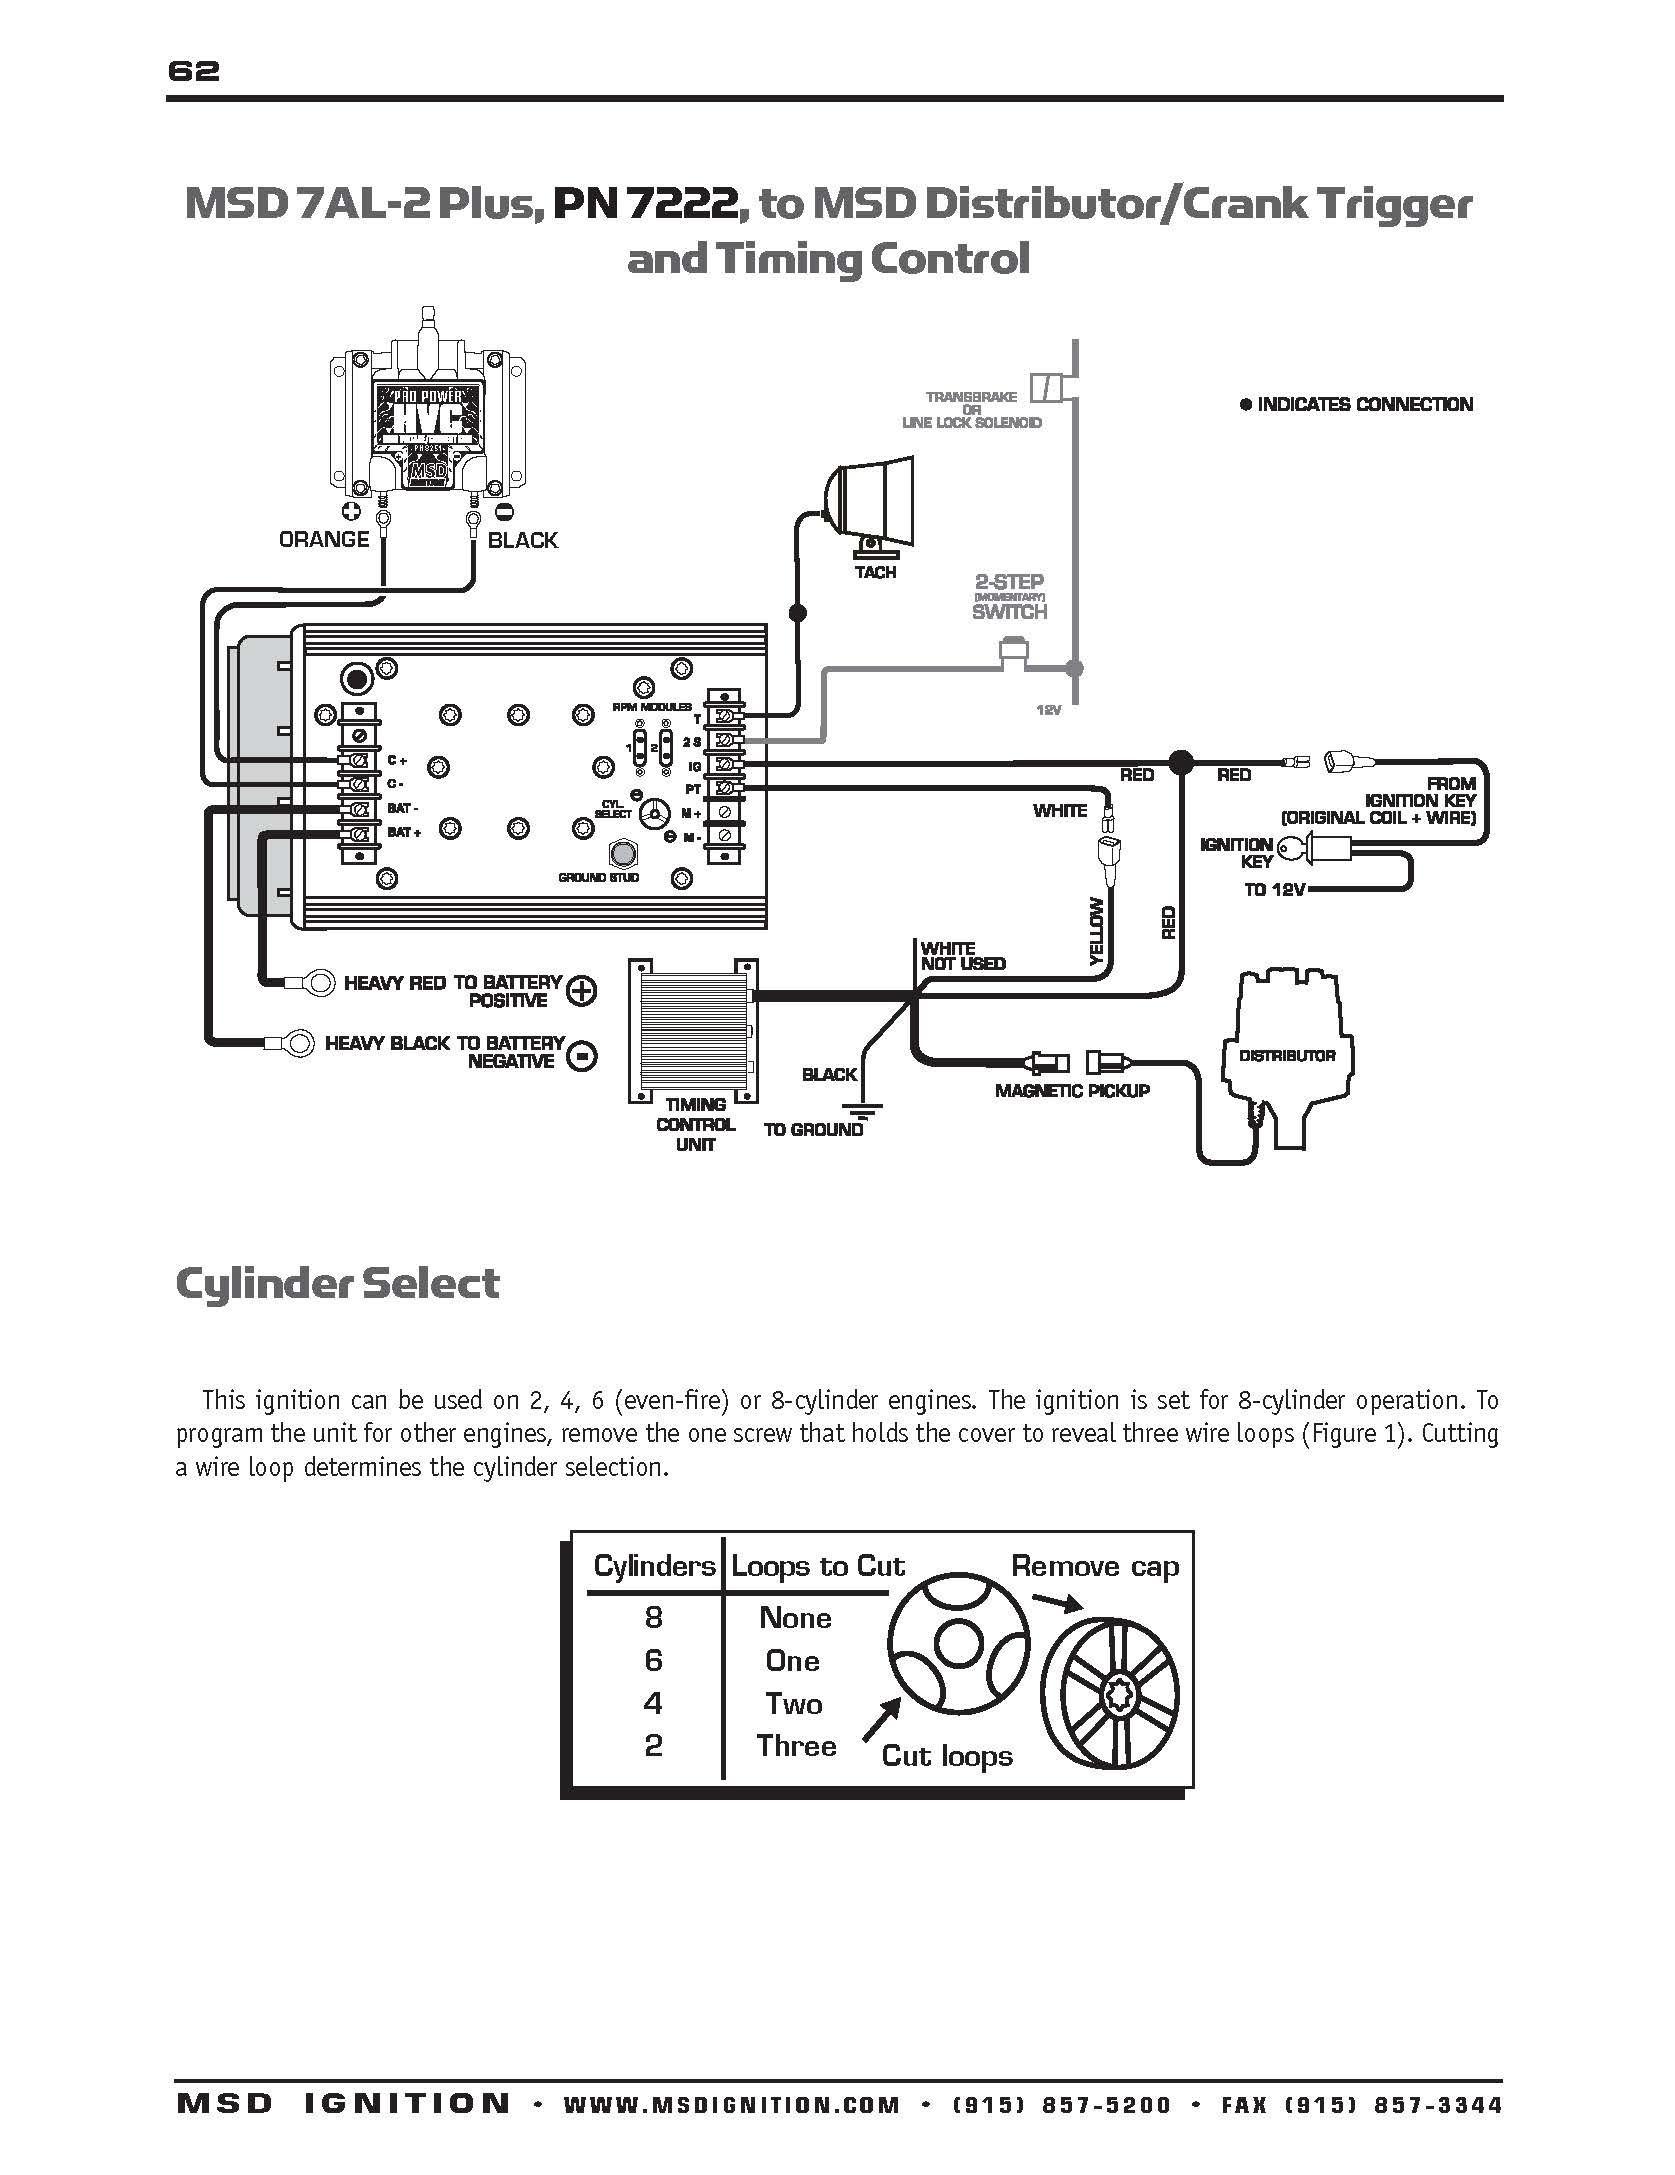 msd grid ignition wiring diagram simple electronic circuits u2022 rh wiringdiagramone today Installing MSD 7AL